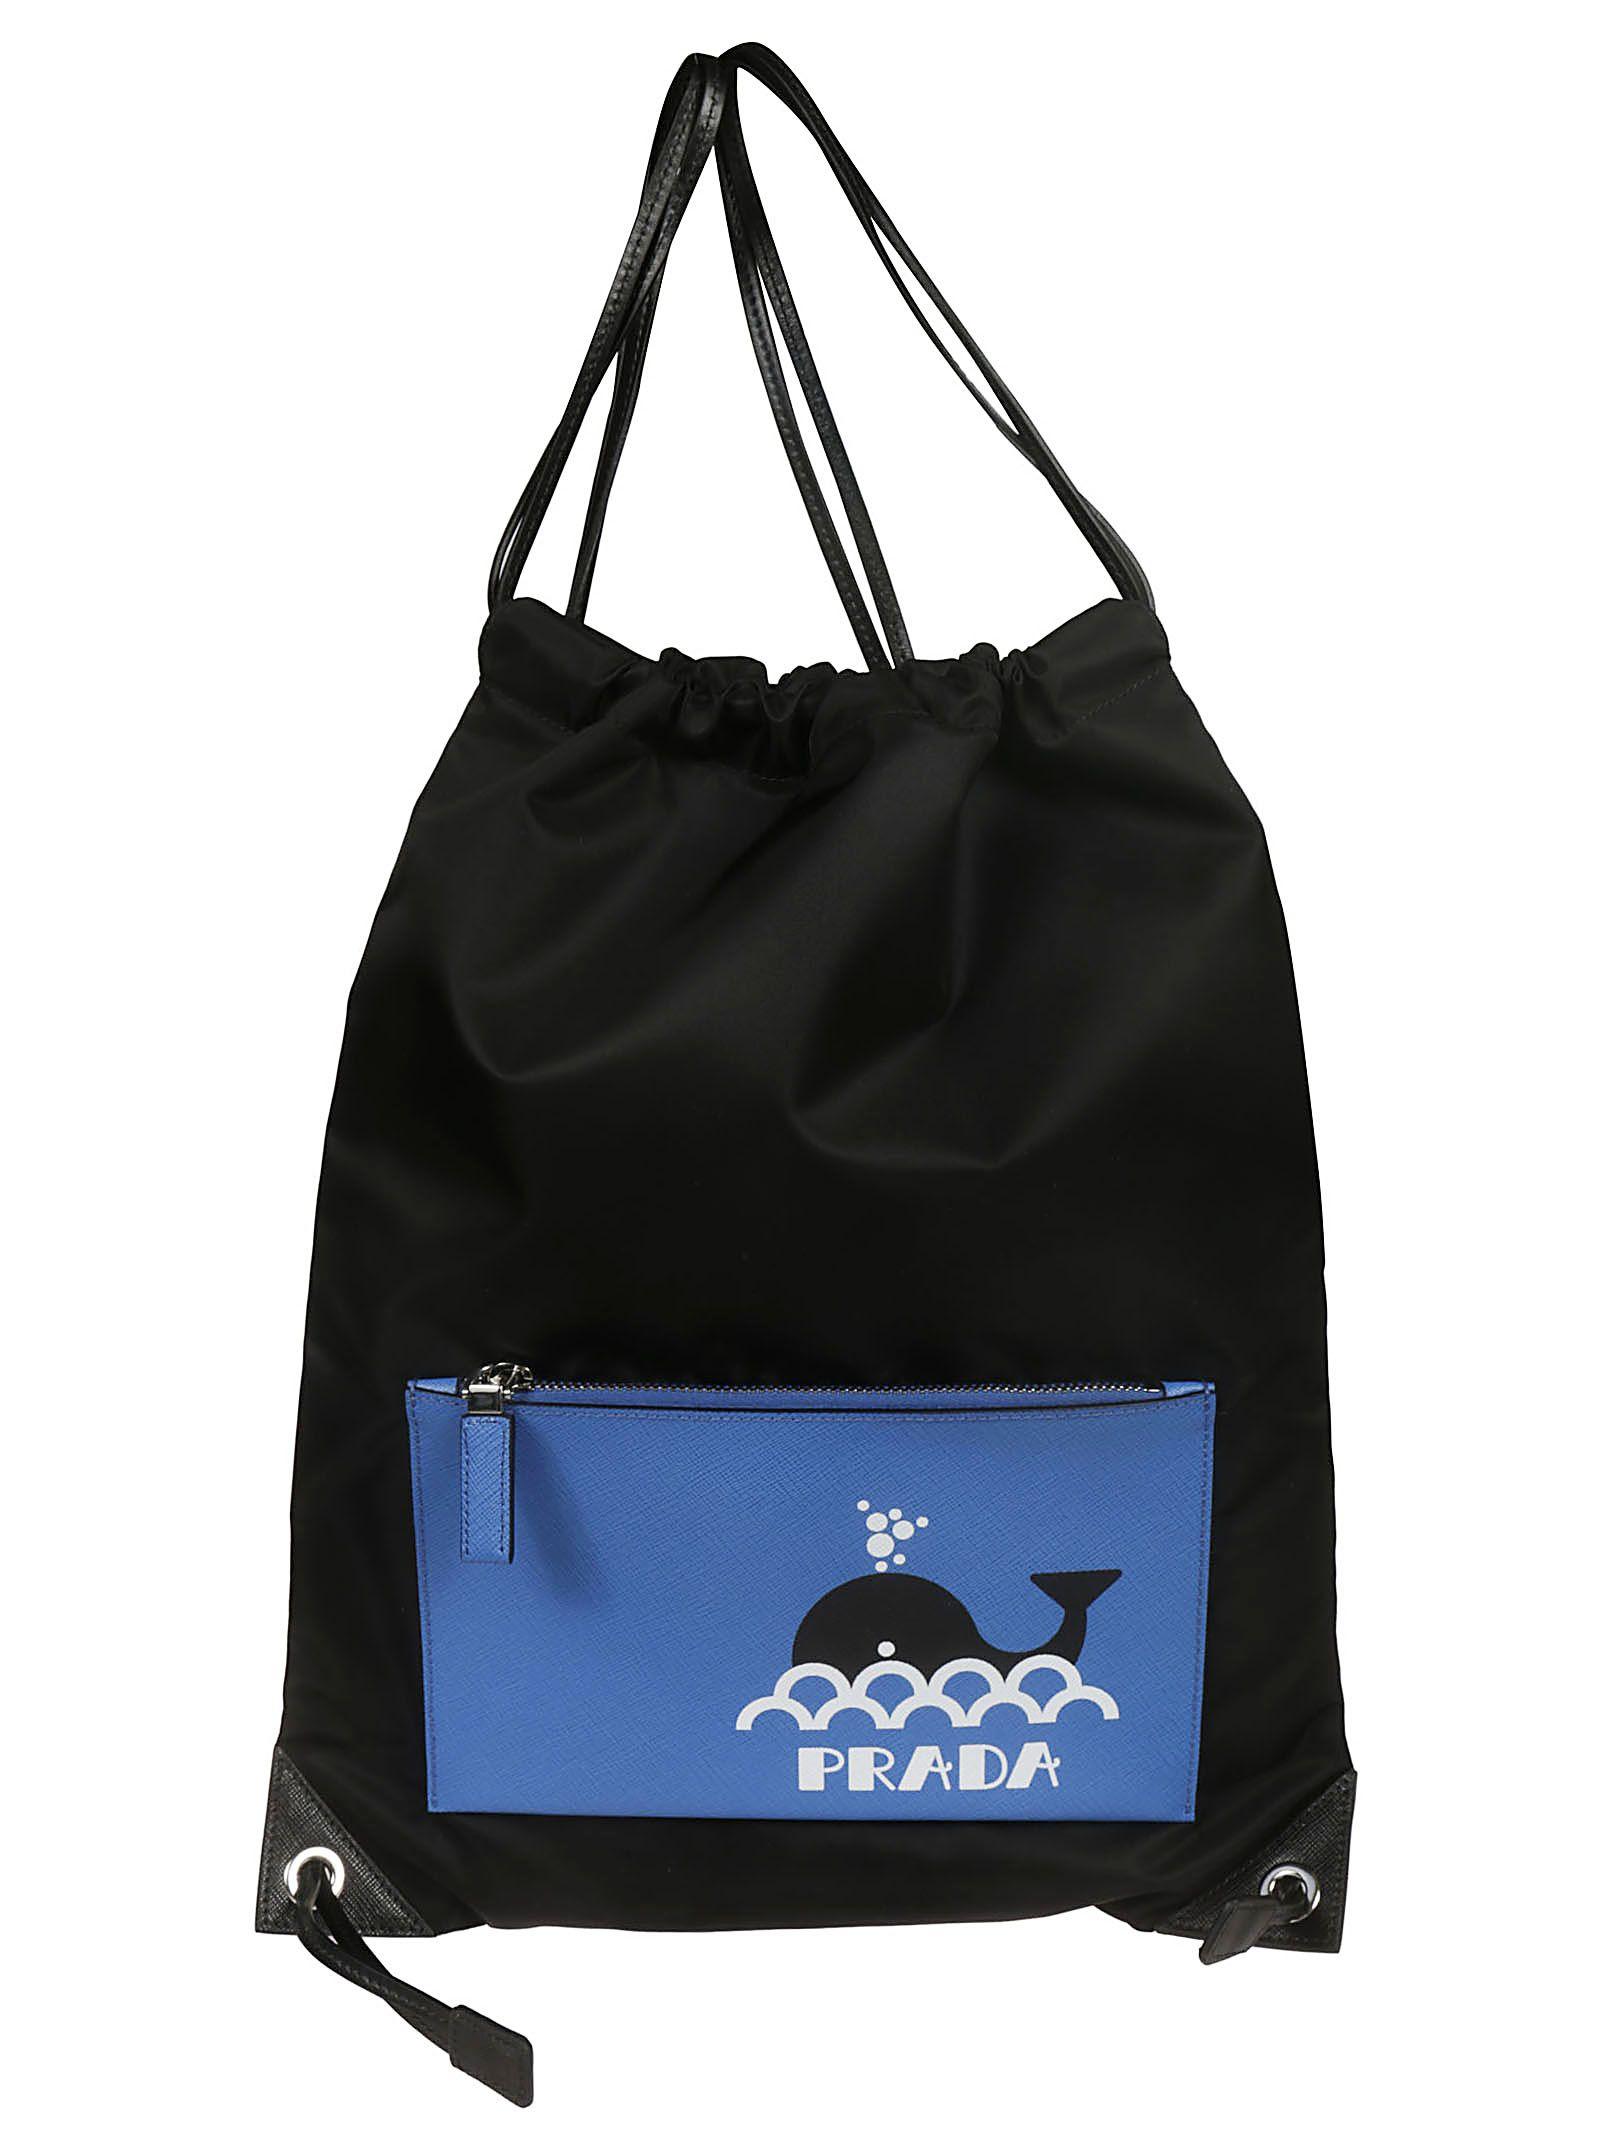 986e86492bcb Prada Prada Drawstring Backpack - Black/Blue - 10930632 | italist